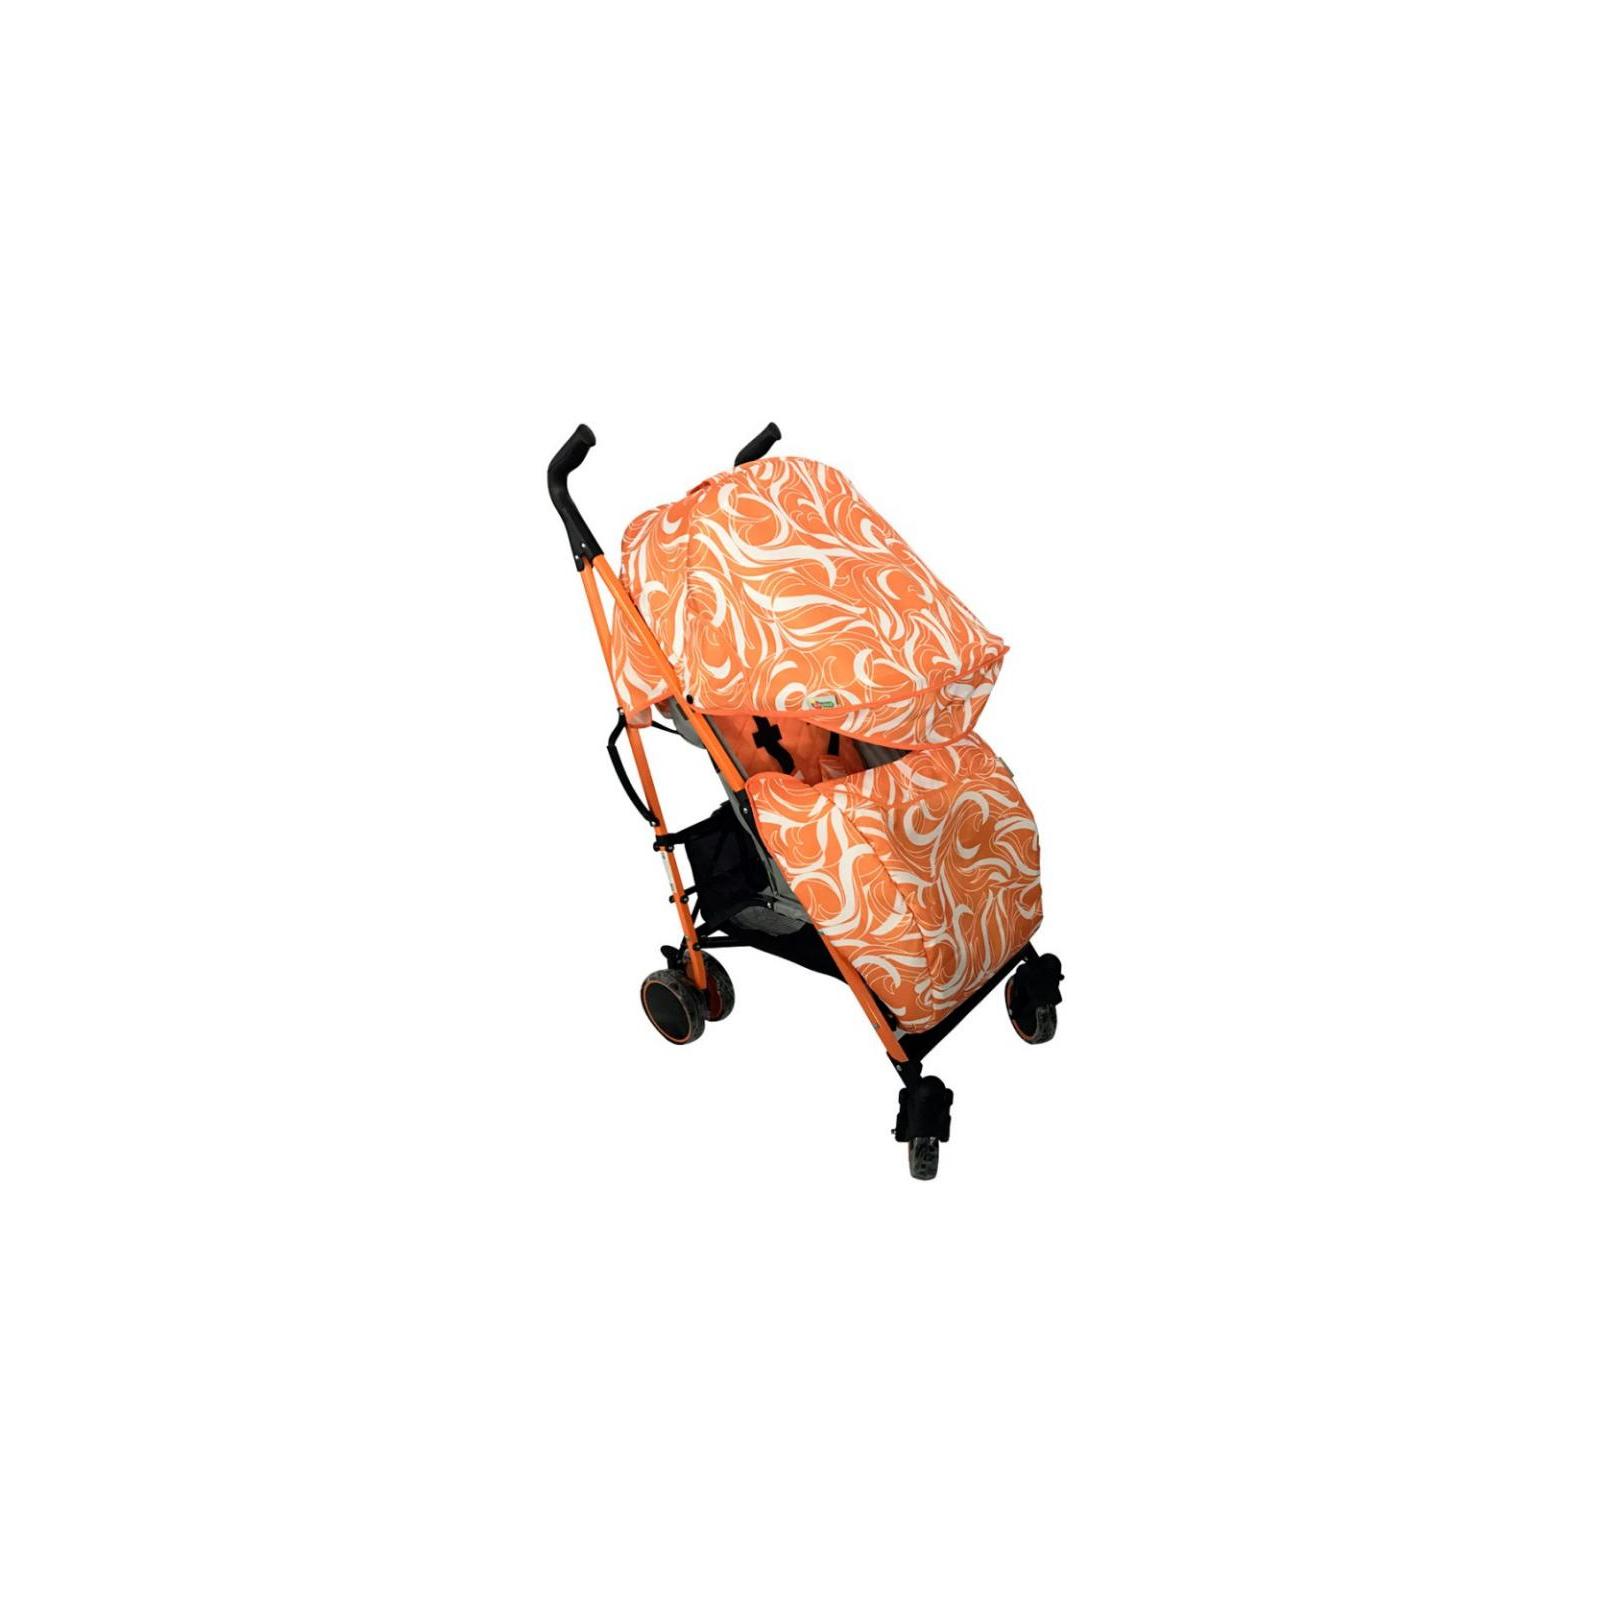 Коляска BabyHit Handy White-orange (22740) изображение 2